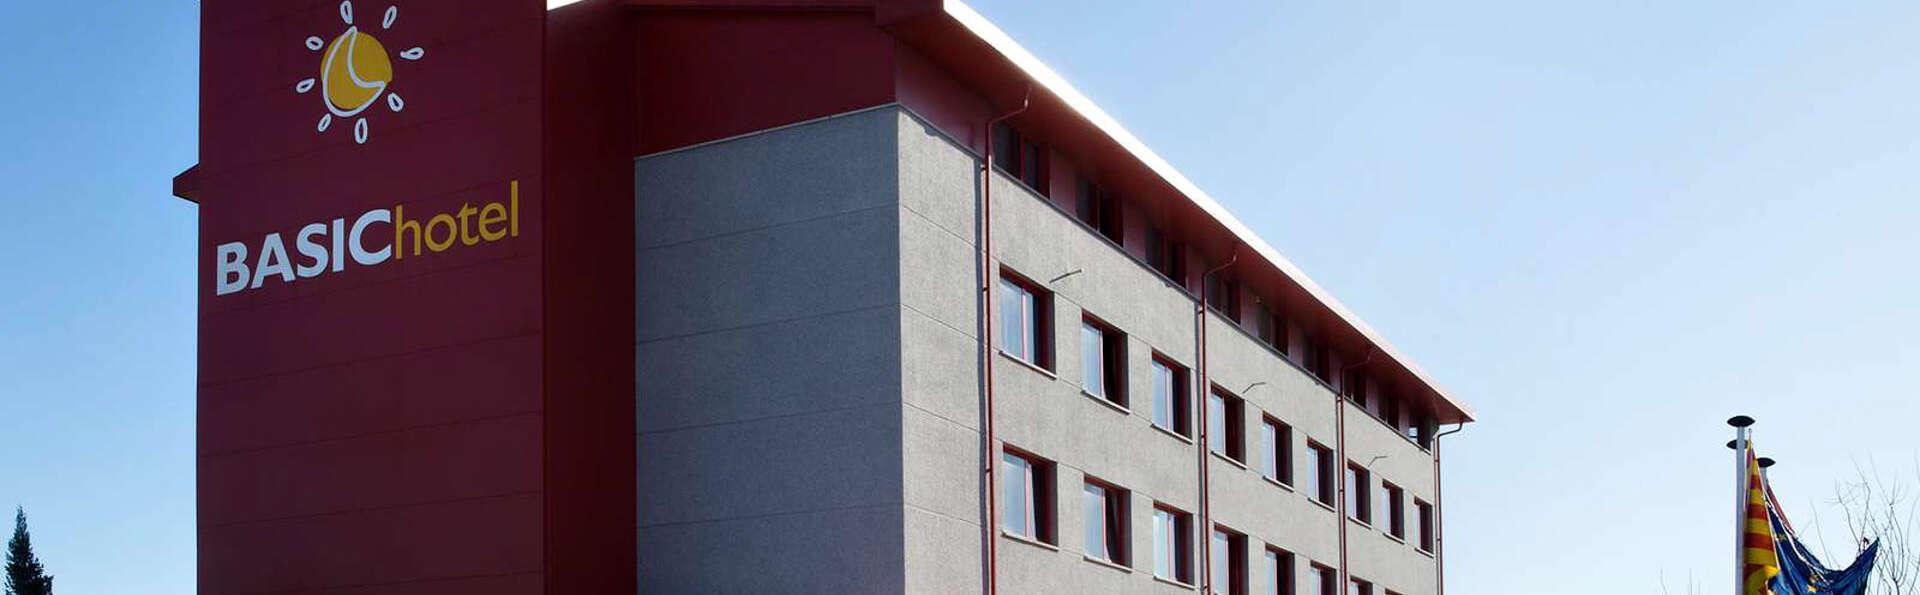 Basic Hotel - EDIT_FRONT_1.jpg